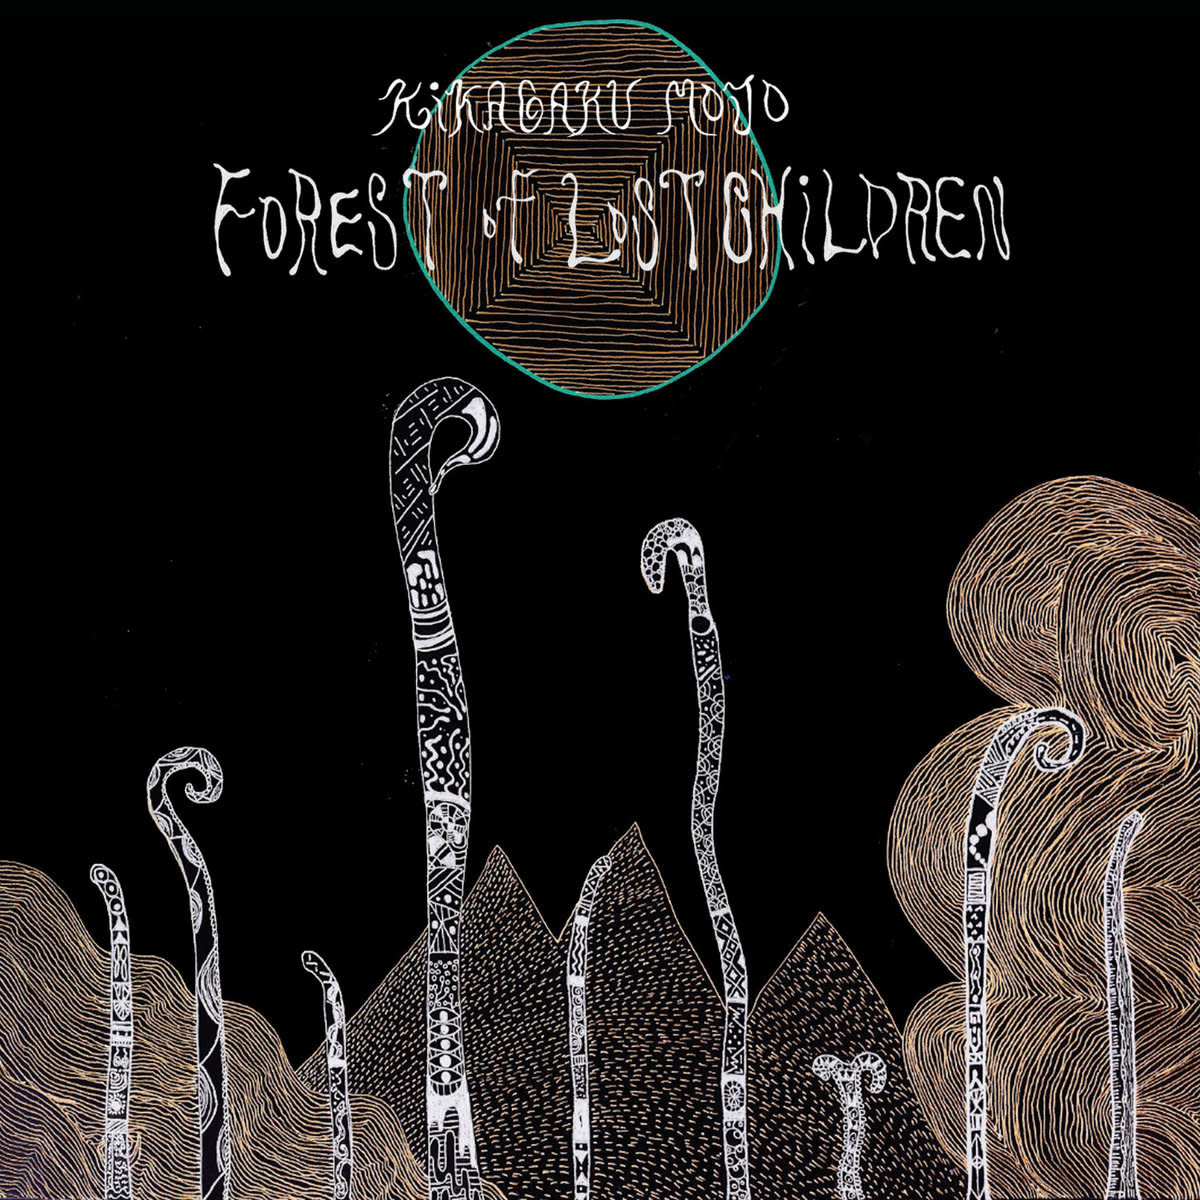 Beyond Beyond Is Beyond Kikagaku Moyo - Forest Of Lost Children (Coloured Vinyl)